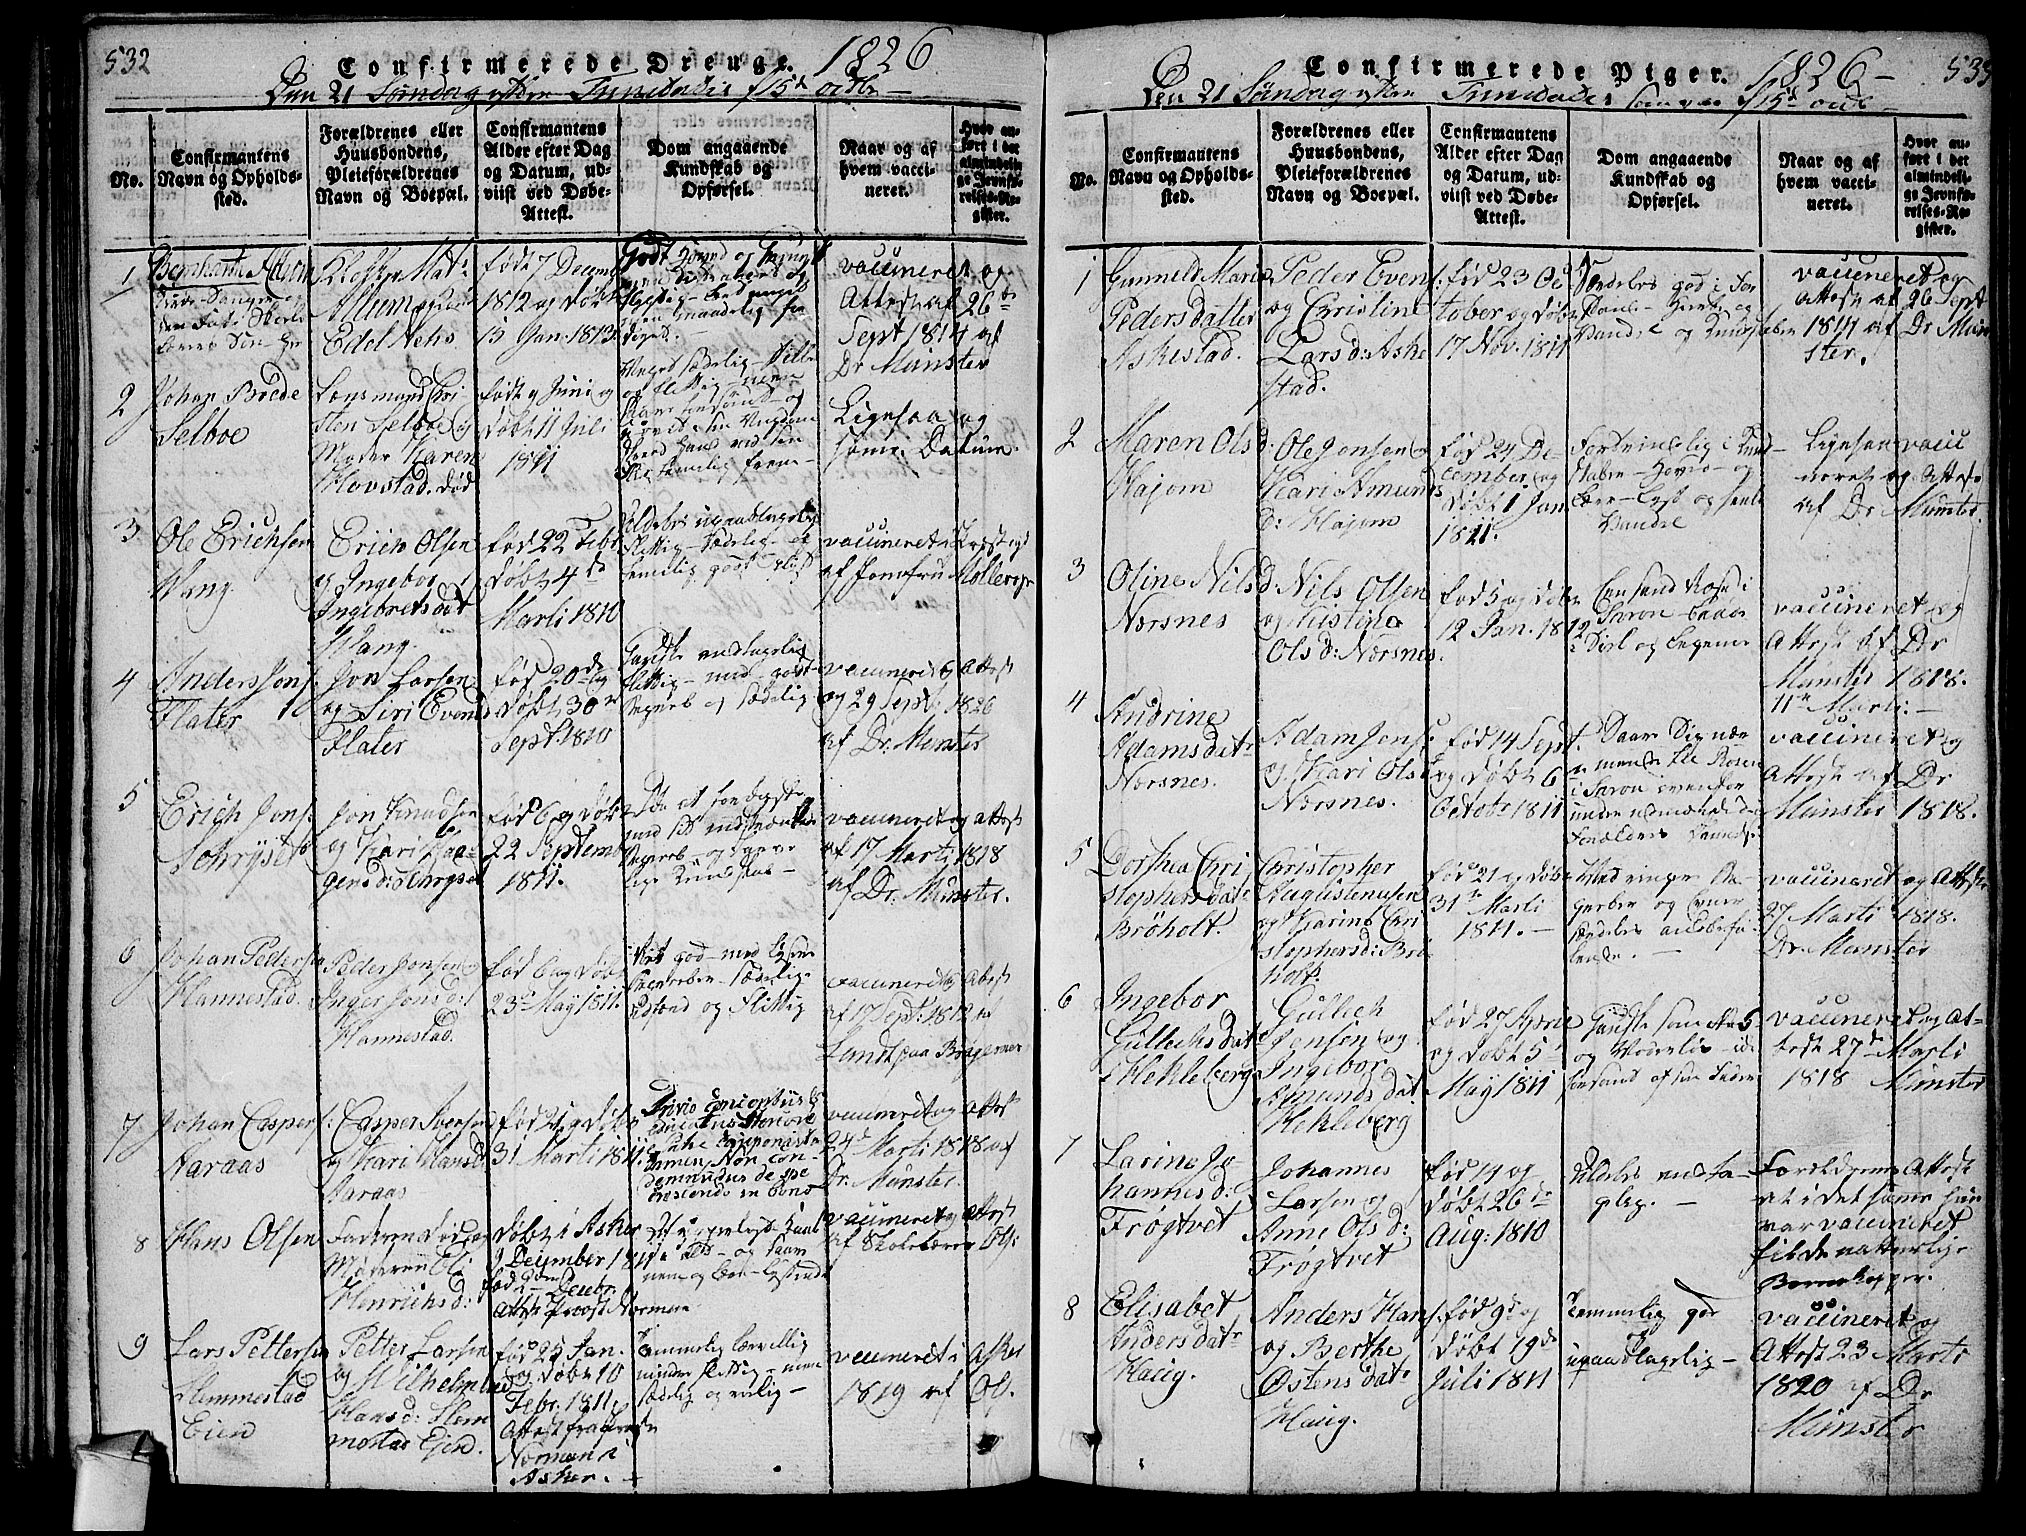 SAKO, Røyken kirkebøker, F/Fa/L0004: Parish register (official) no. 4, 1814-1832, p. 532-533